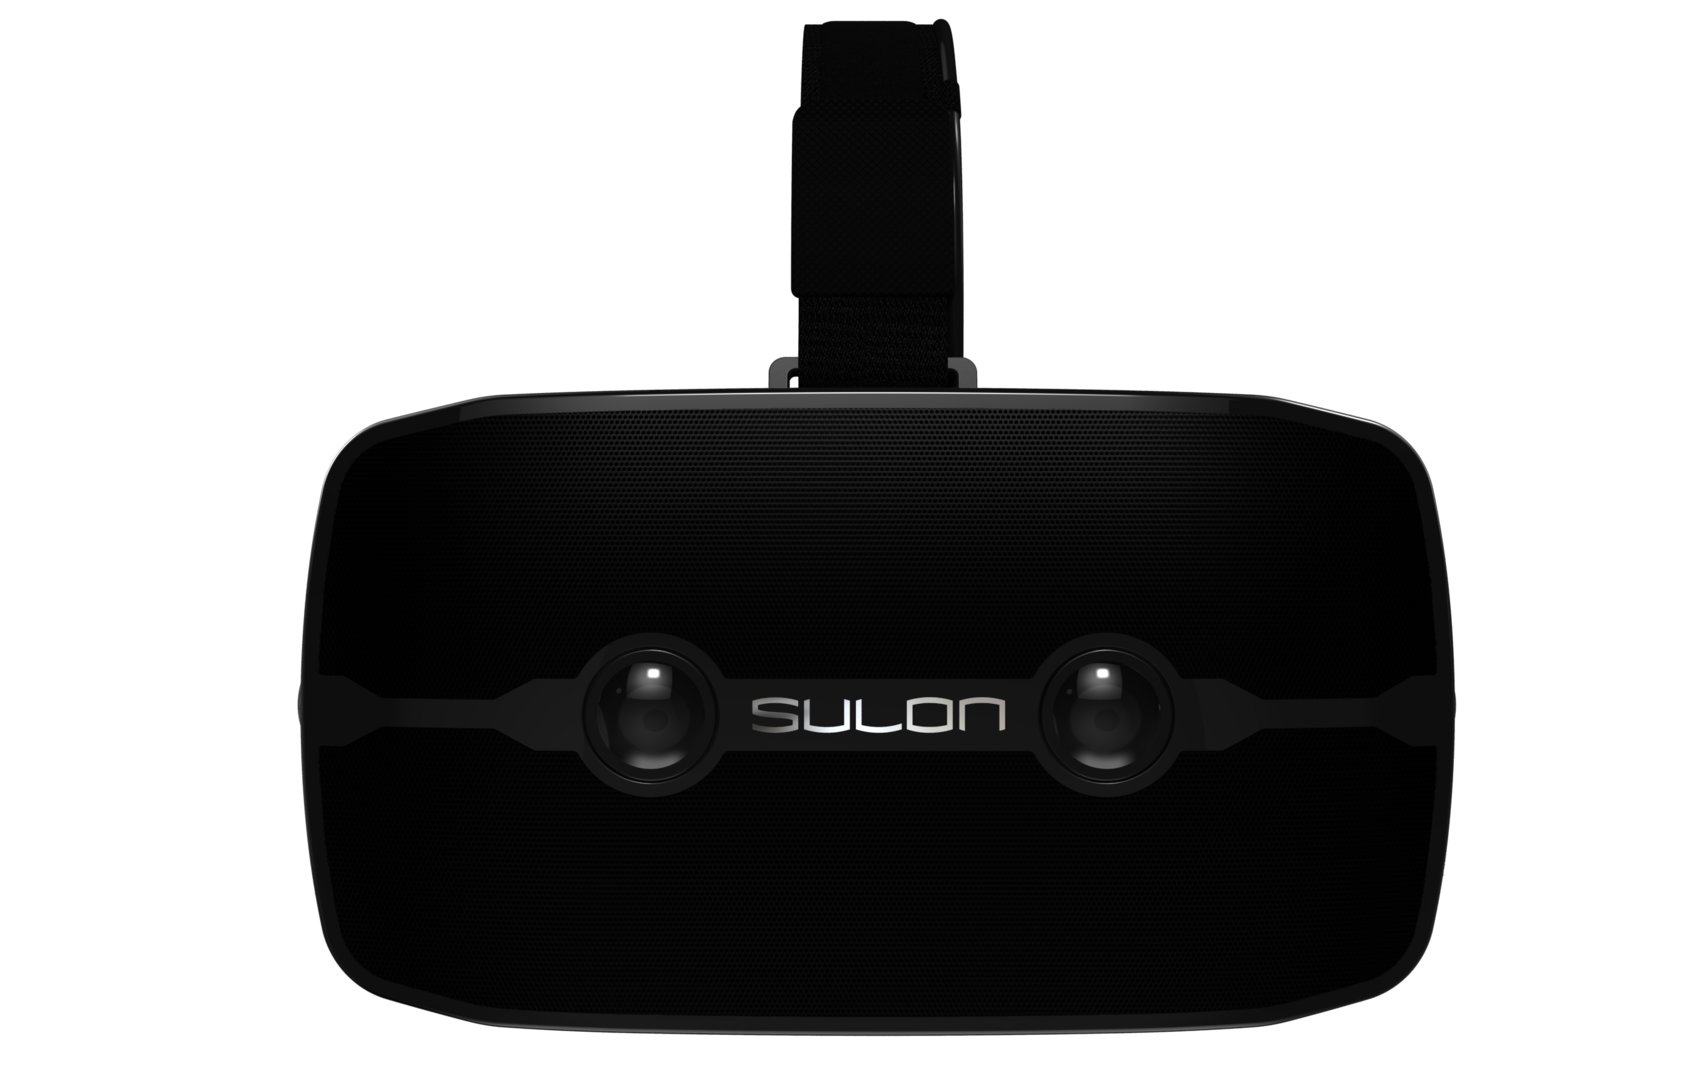 Sulon Q Headset